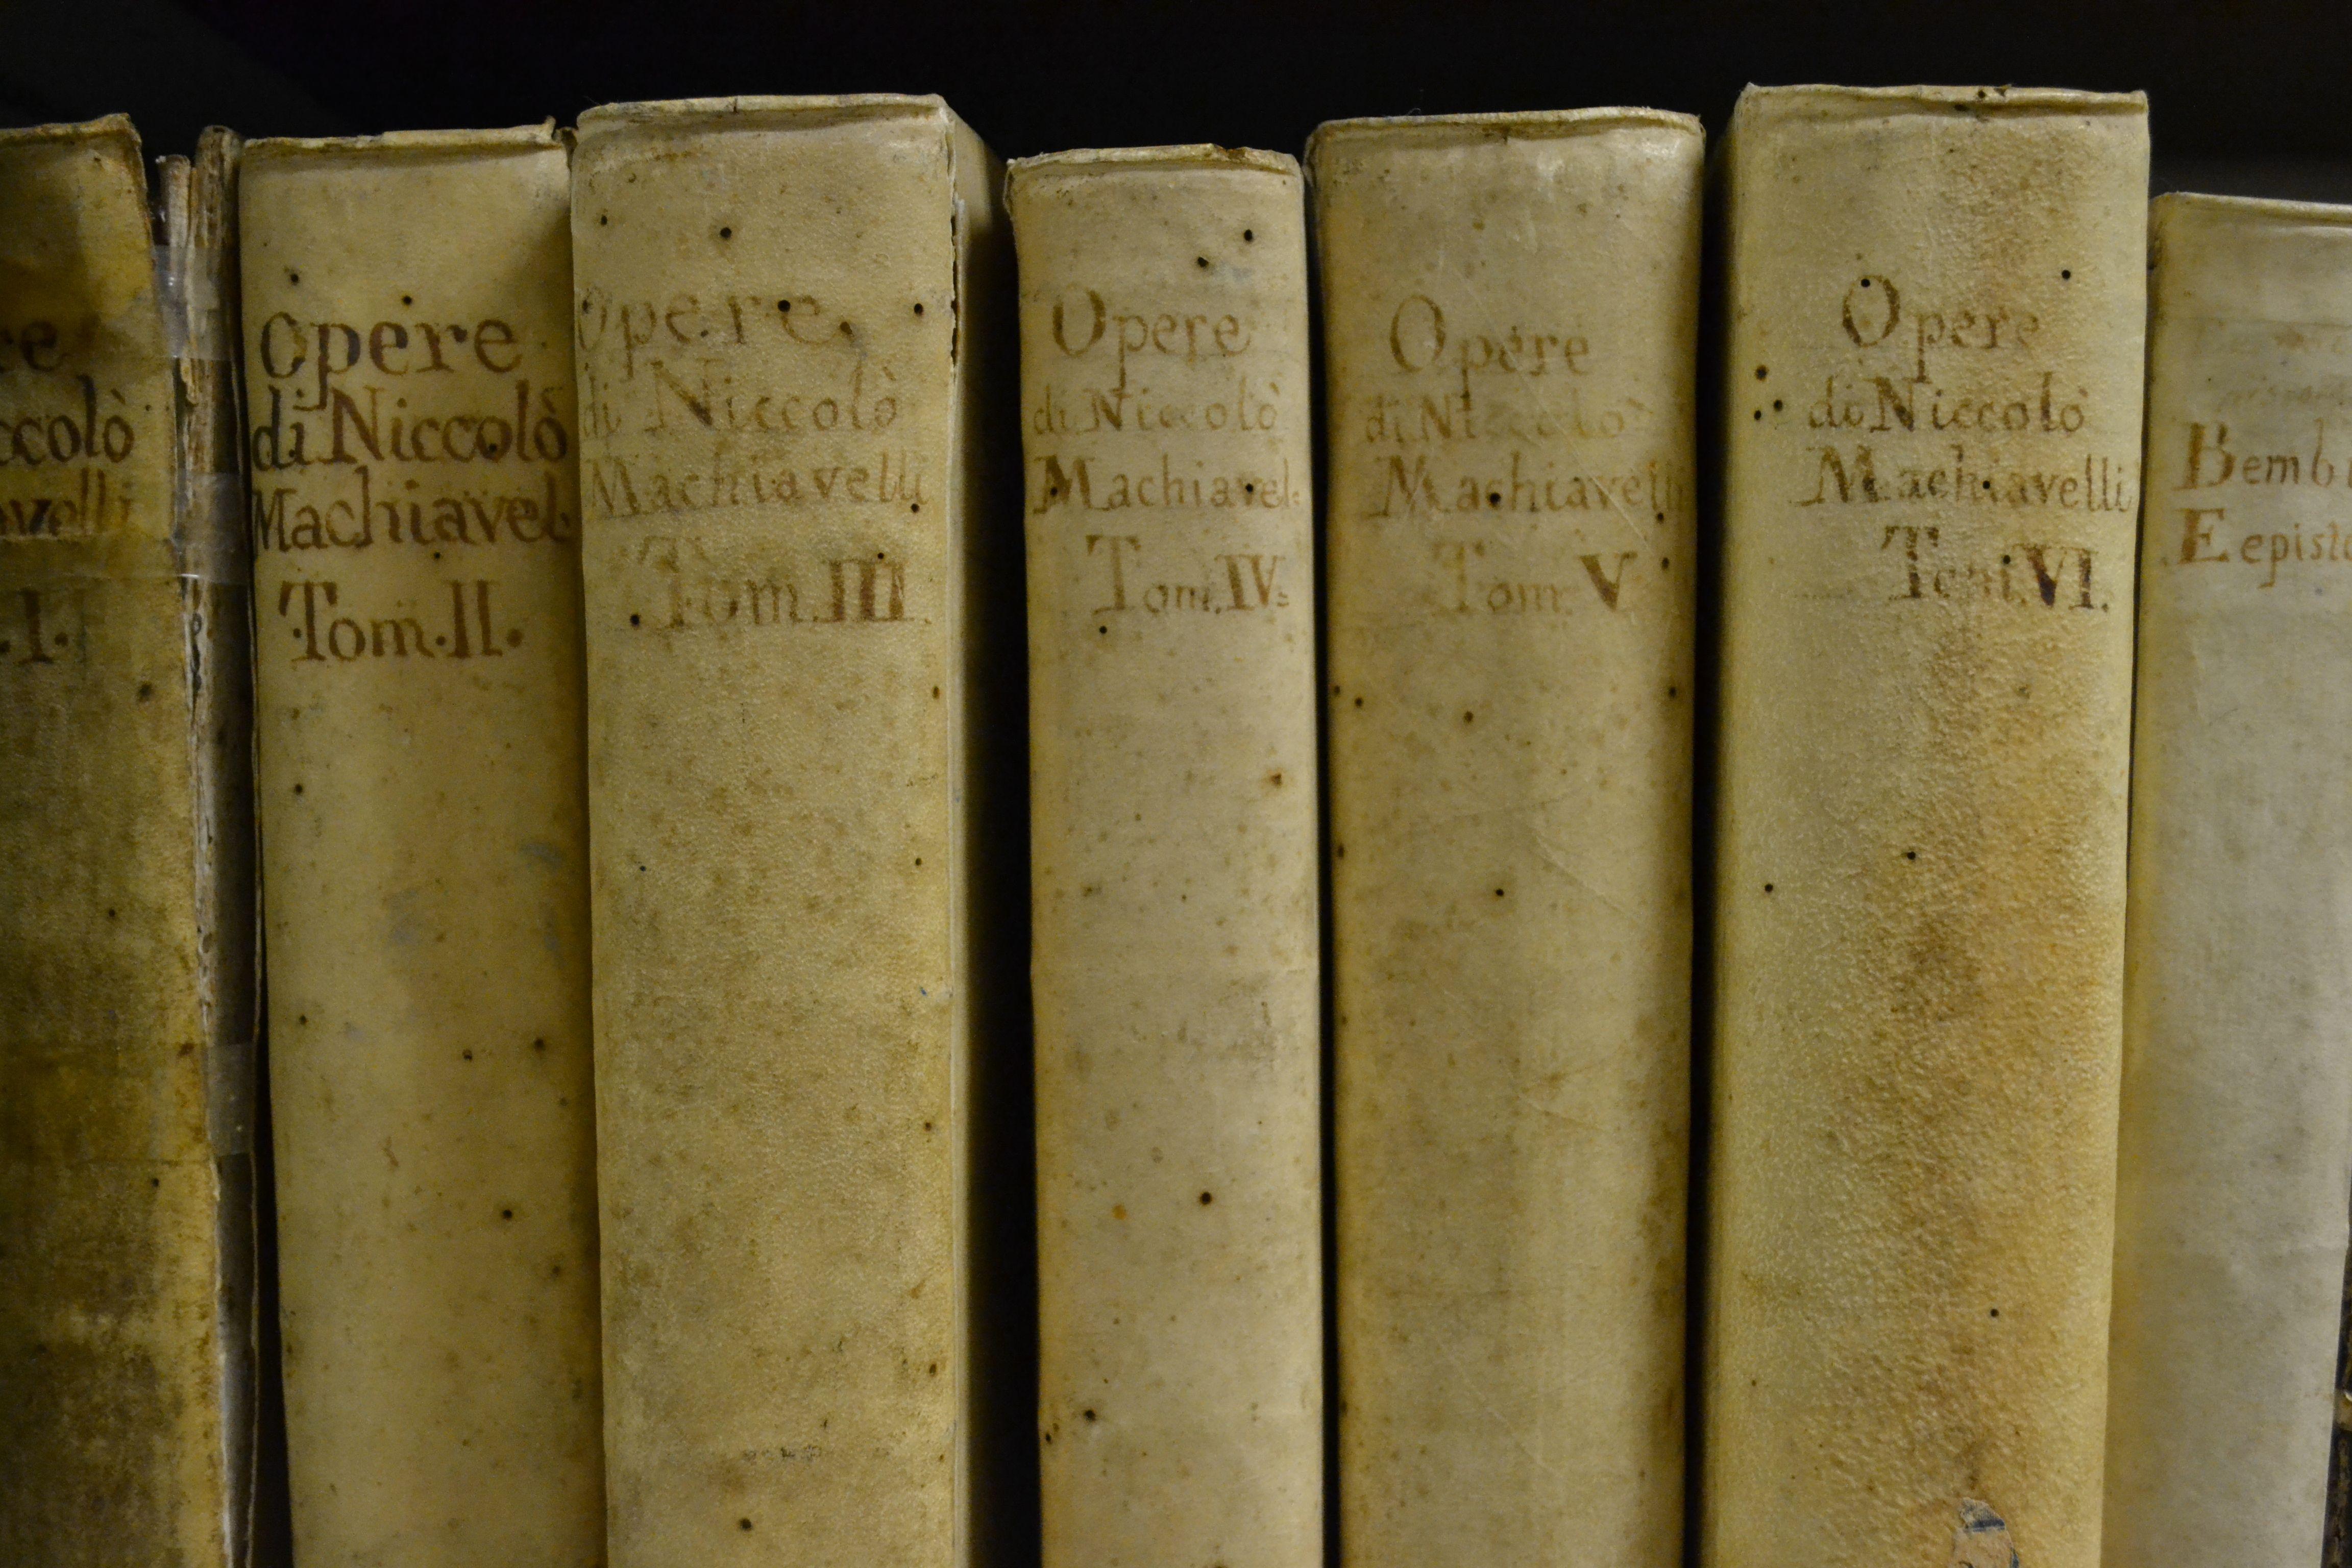 Opere di Niccolò Machiavelli   Старые книги, Книги